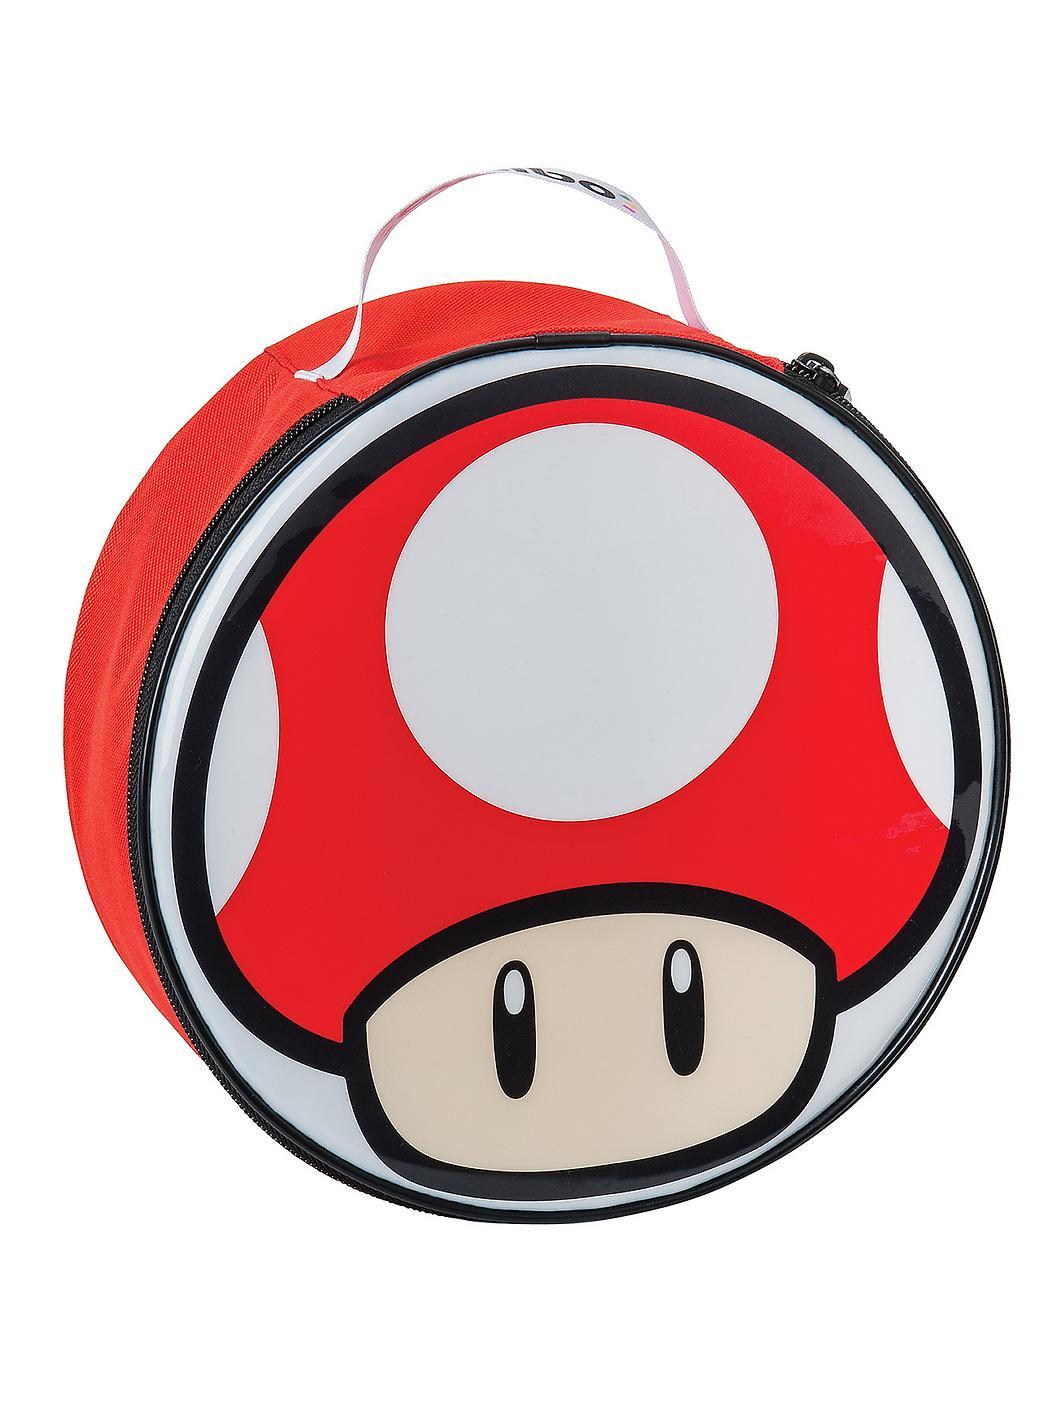 nintendo-amiibo-1up-mushroom-case.jpg?$1